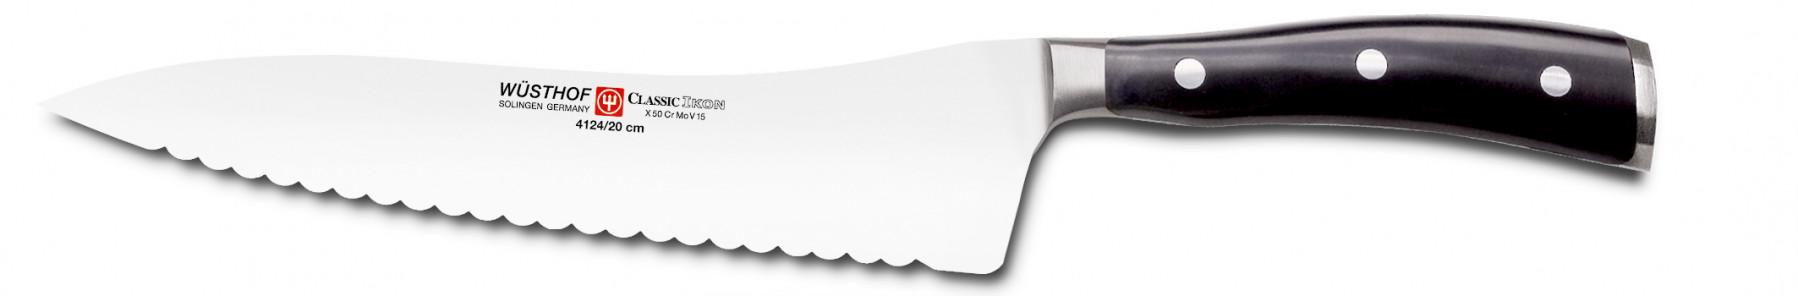 Wüsthof Dreizack Classic Ikon Brotmesser Wave